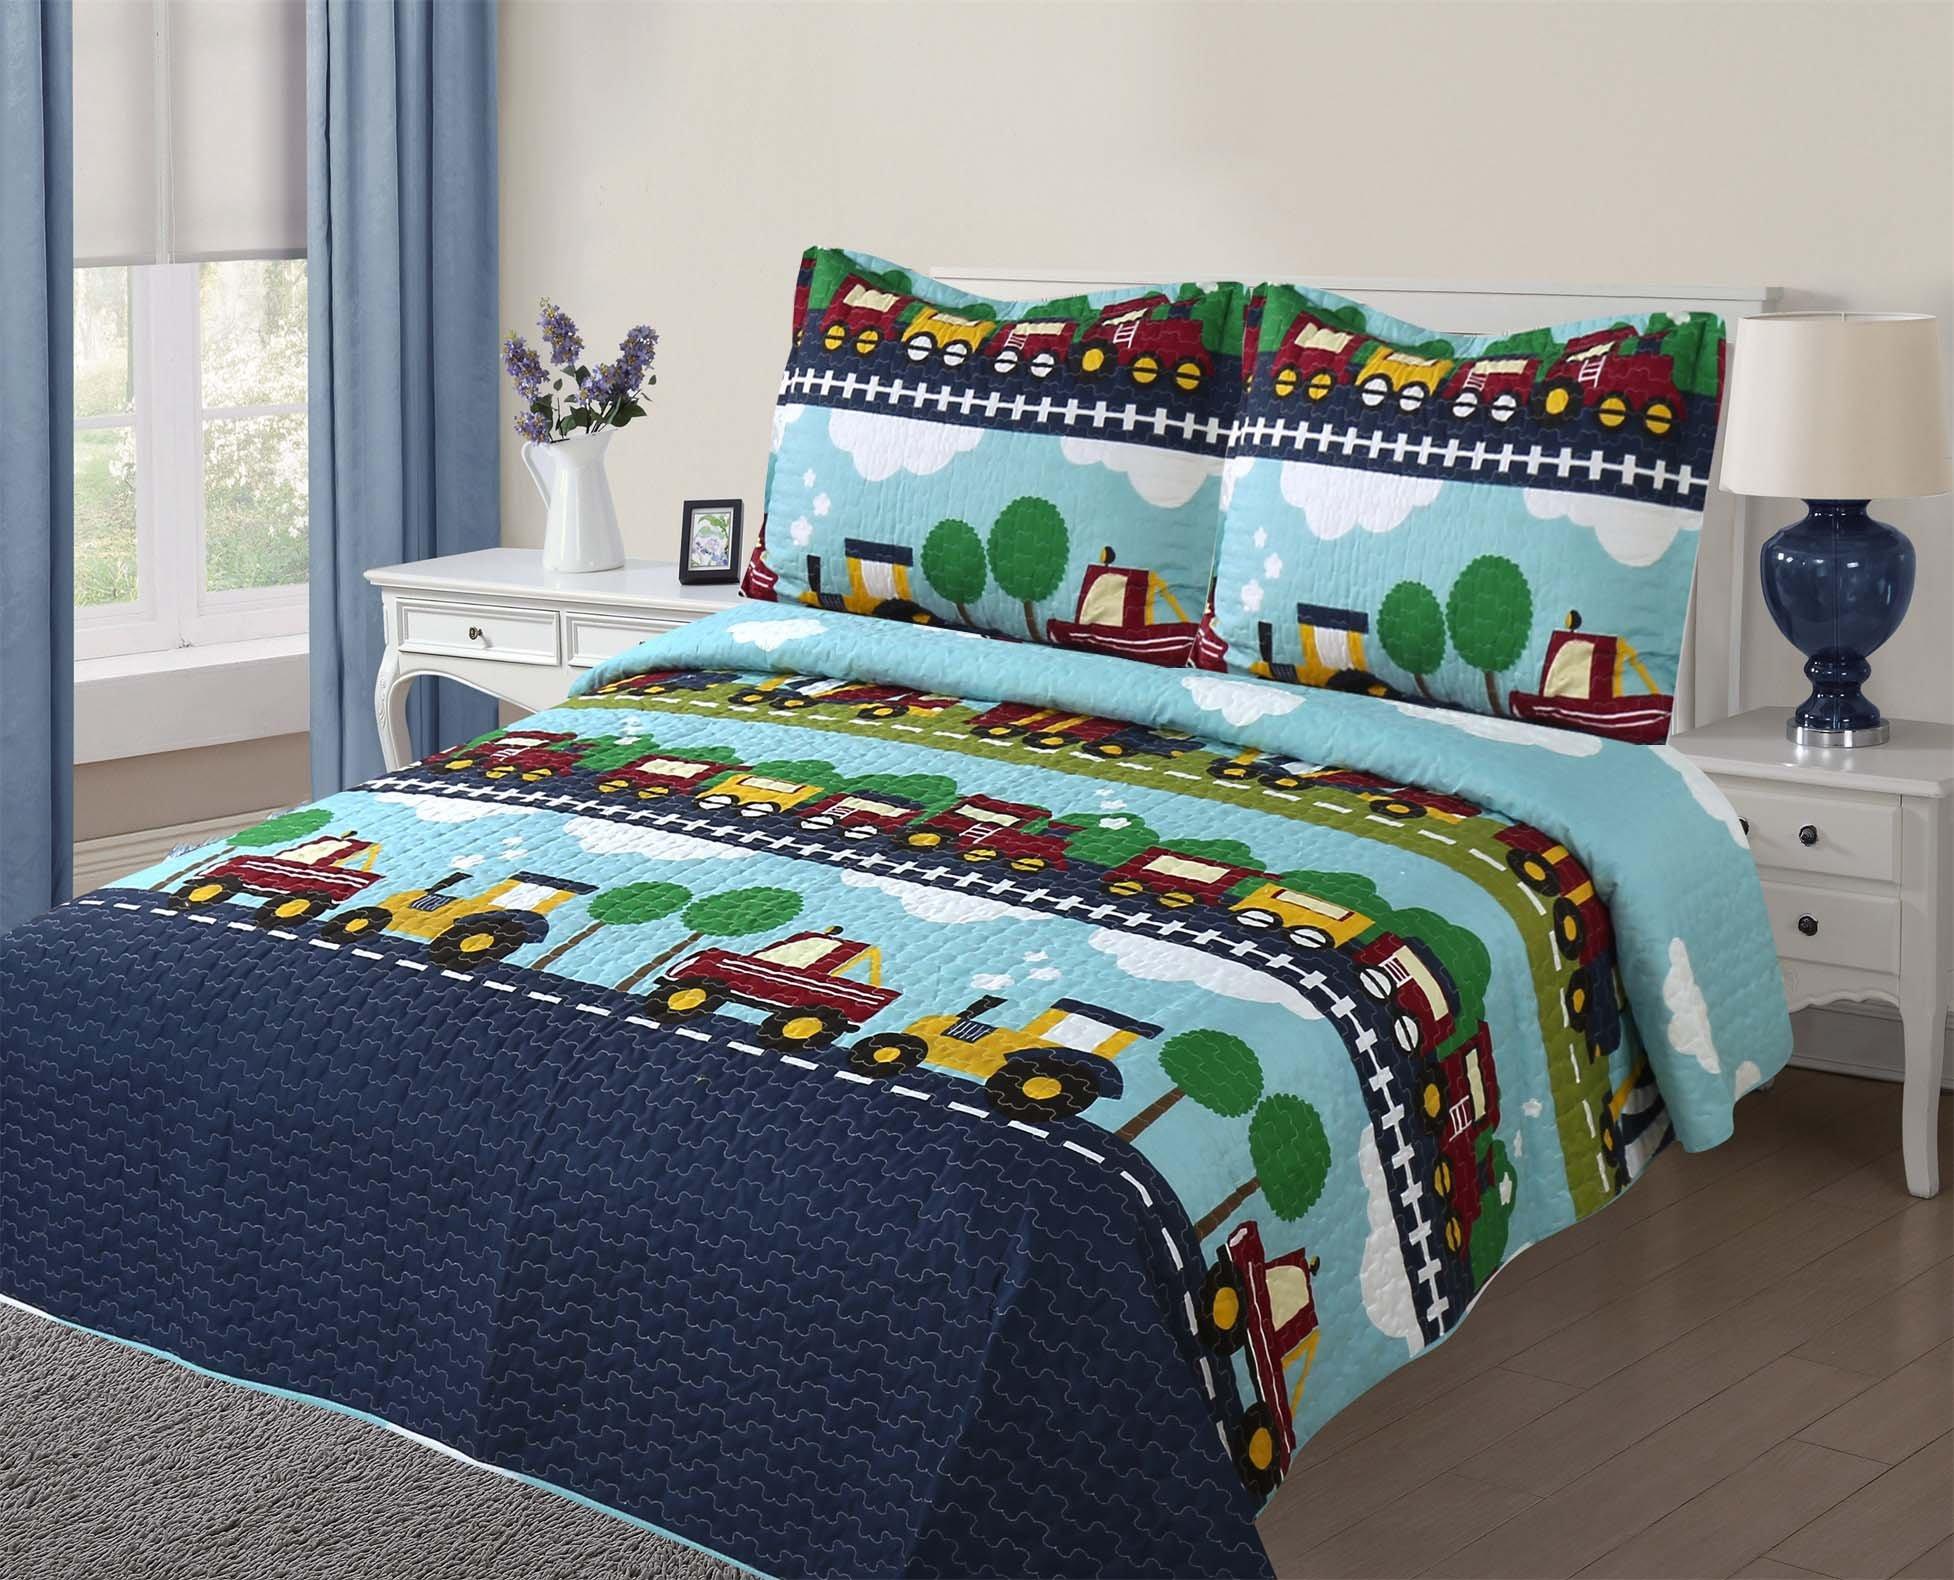 Golden Linens Full Size ( 1 Quilt, 2 Shams) Navy Blue Aqua Blue Trains Air plain Trucks Kids Teens/ Boys Quilt Bedspread 04-16 boys